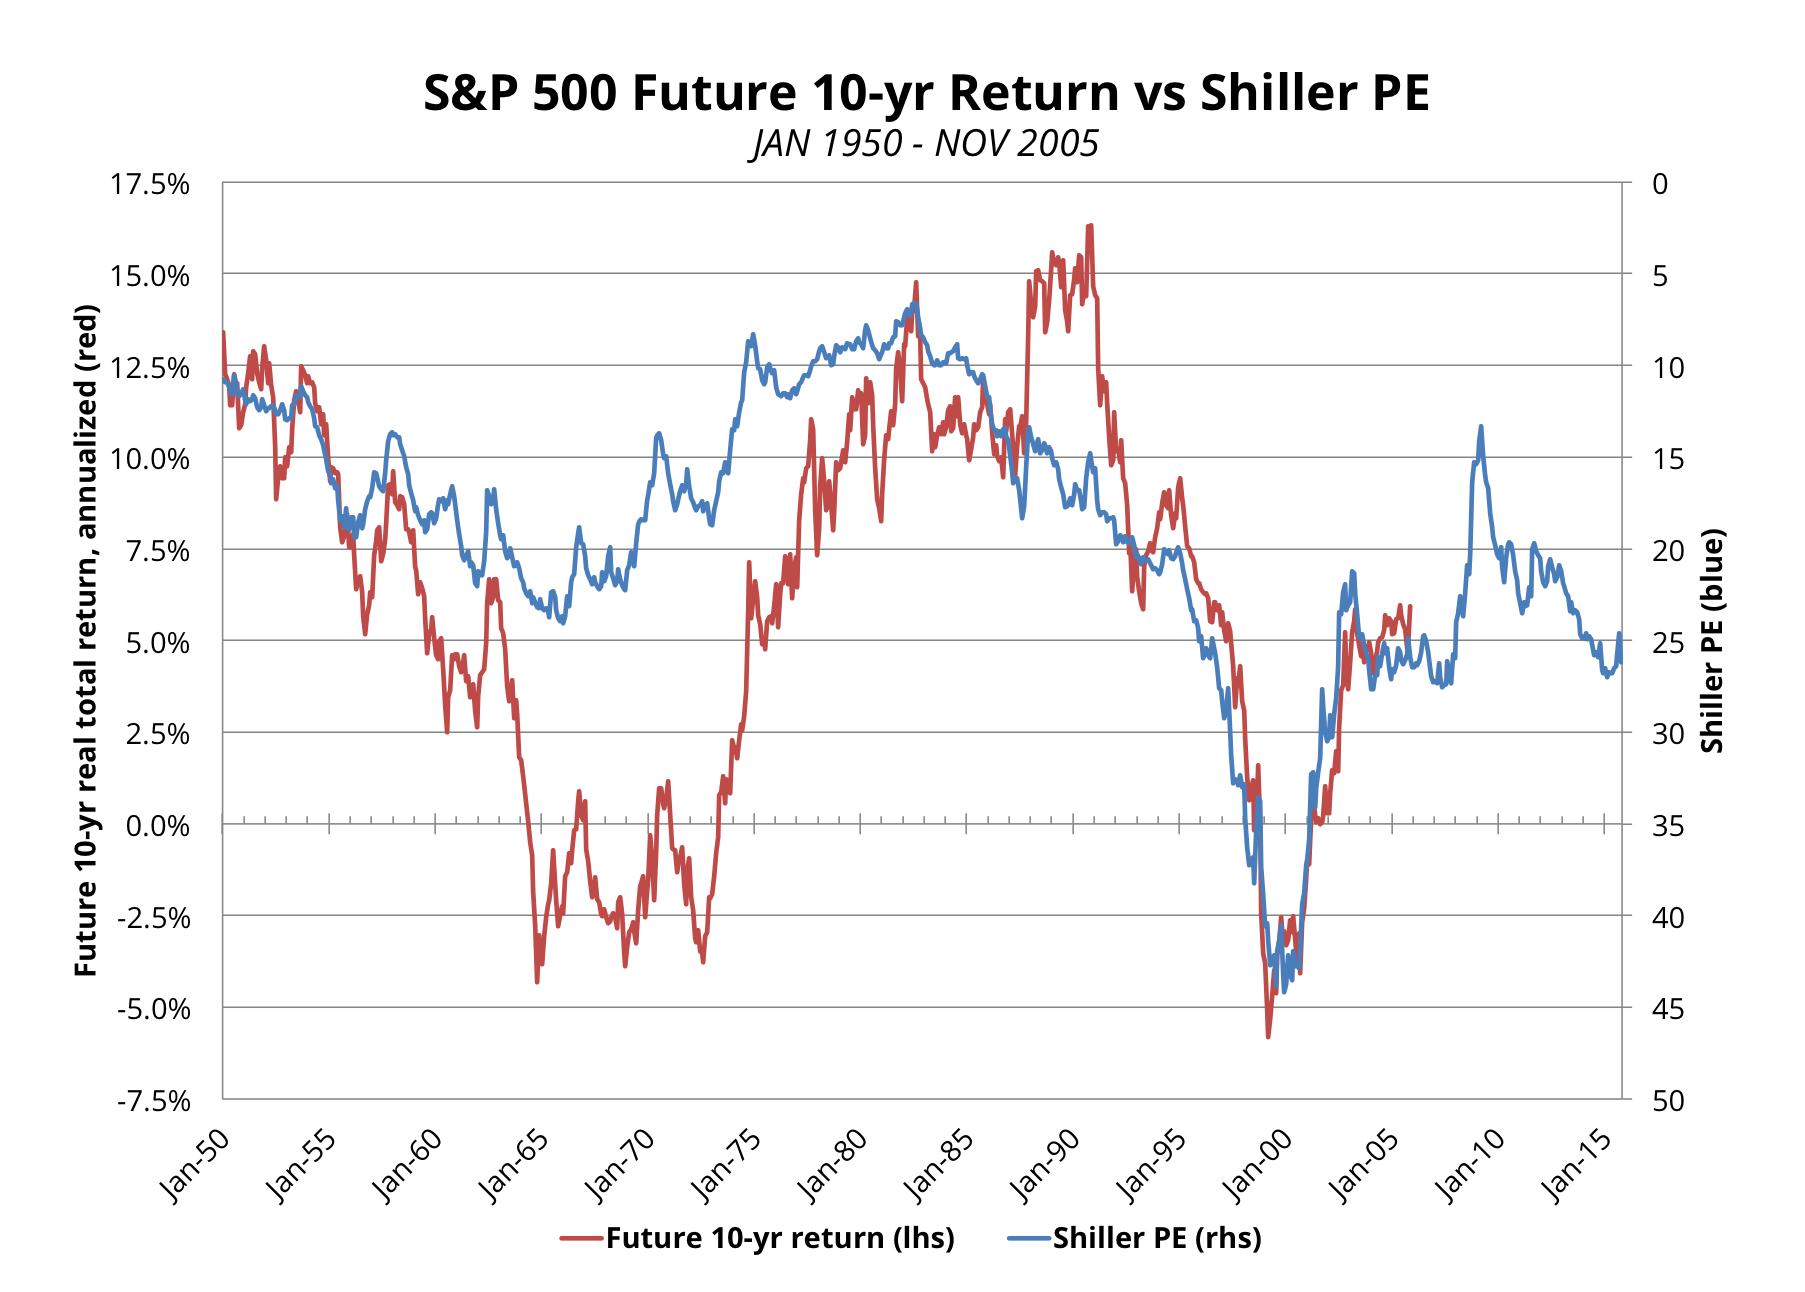 Source: AlphaGlider, Yahoo Finance, Standard & Poor's, Robert Shiller, US Bureau of Labor Statistics